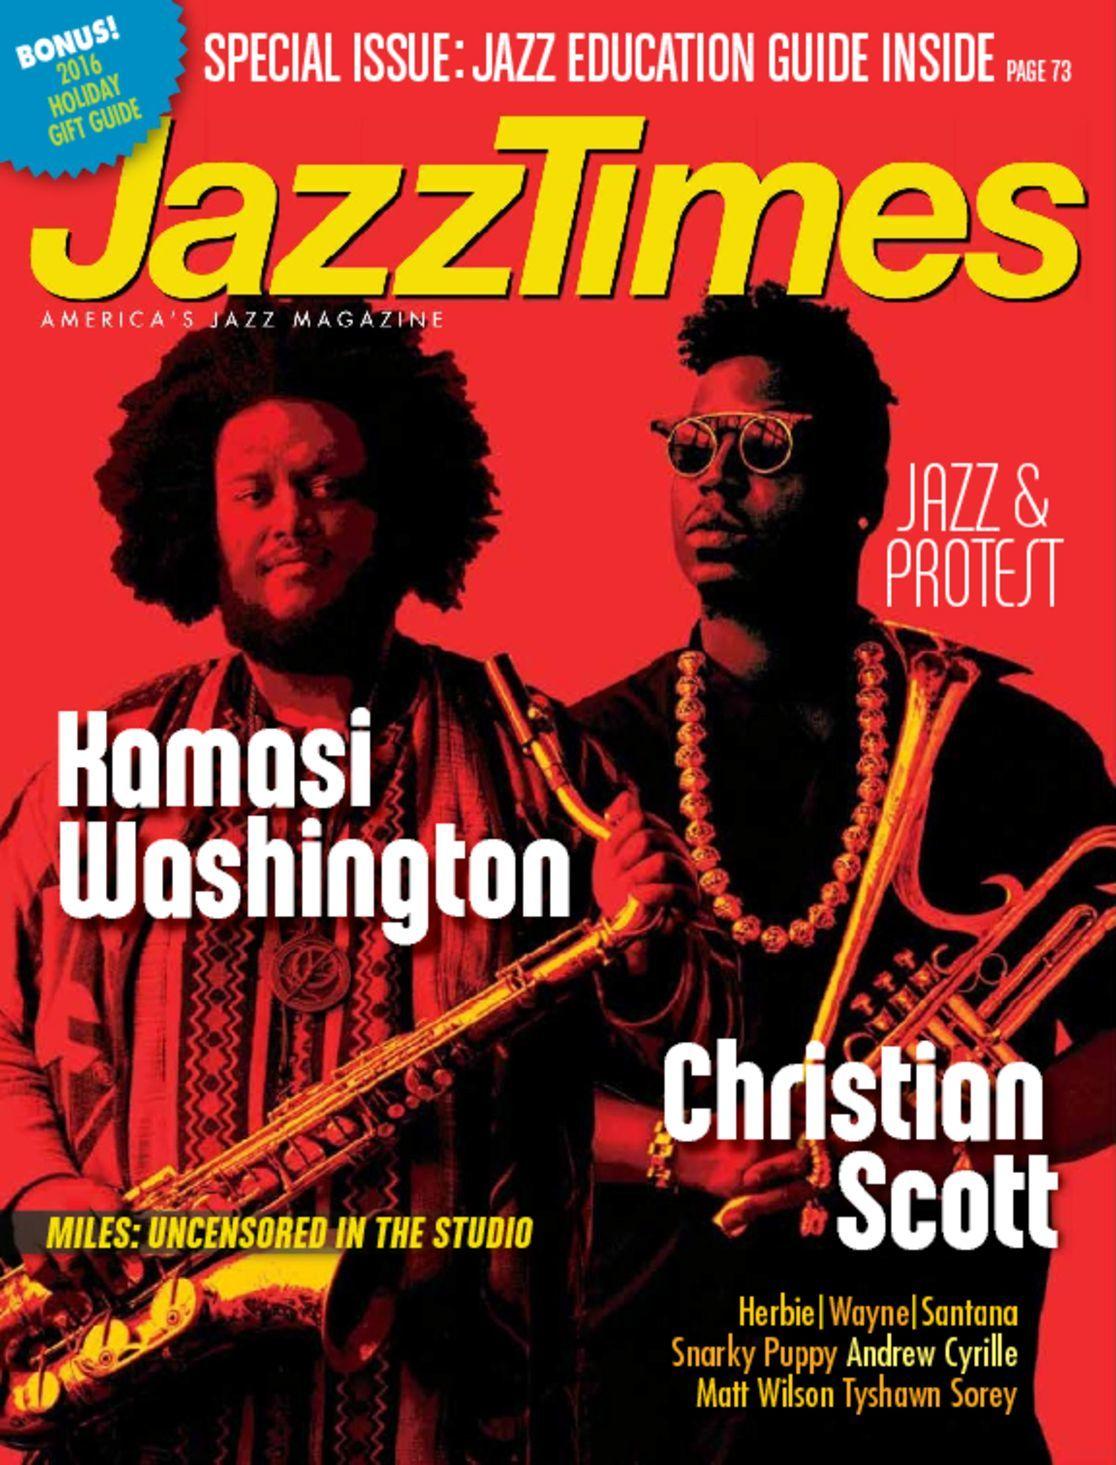 Jazztimes Educational Guide Digital